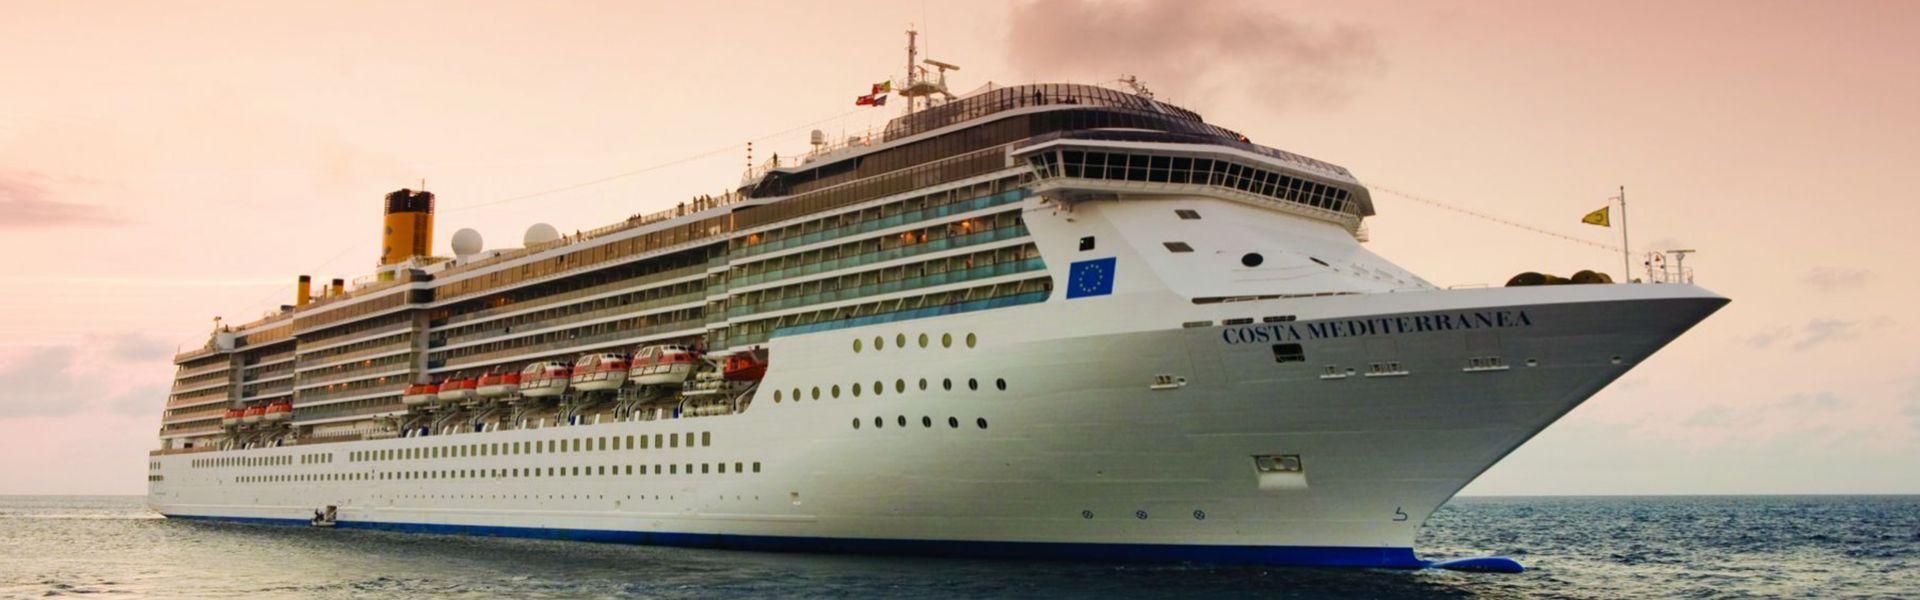 Croaziera 2017 - Mediterana de Vest (Savona - Costa Cruises - Costa Mediterranea - 7 nopti